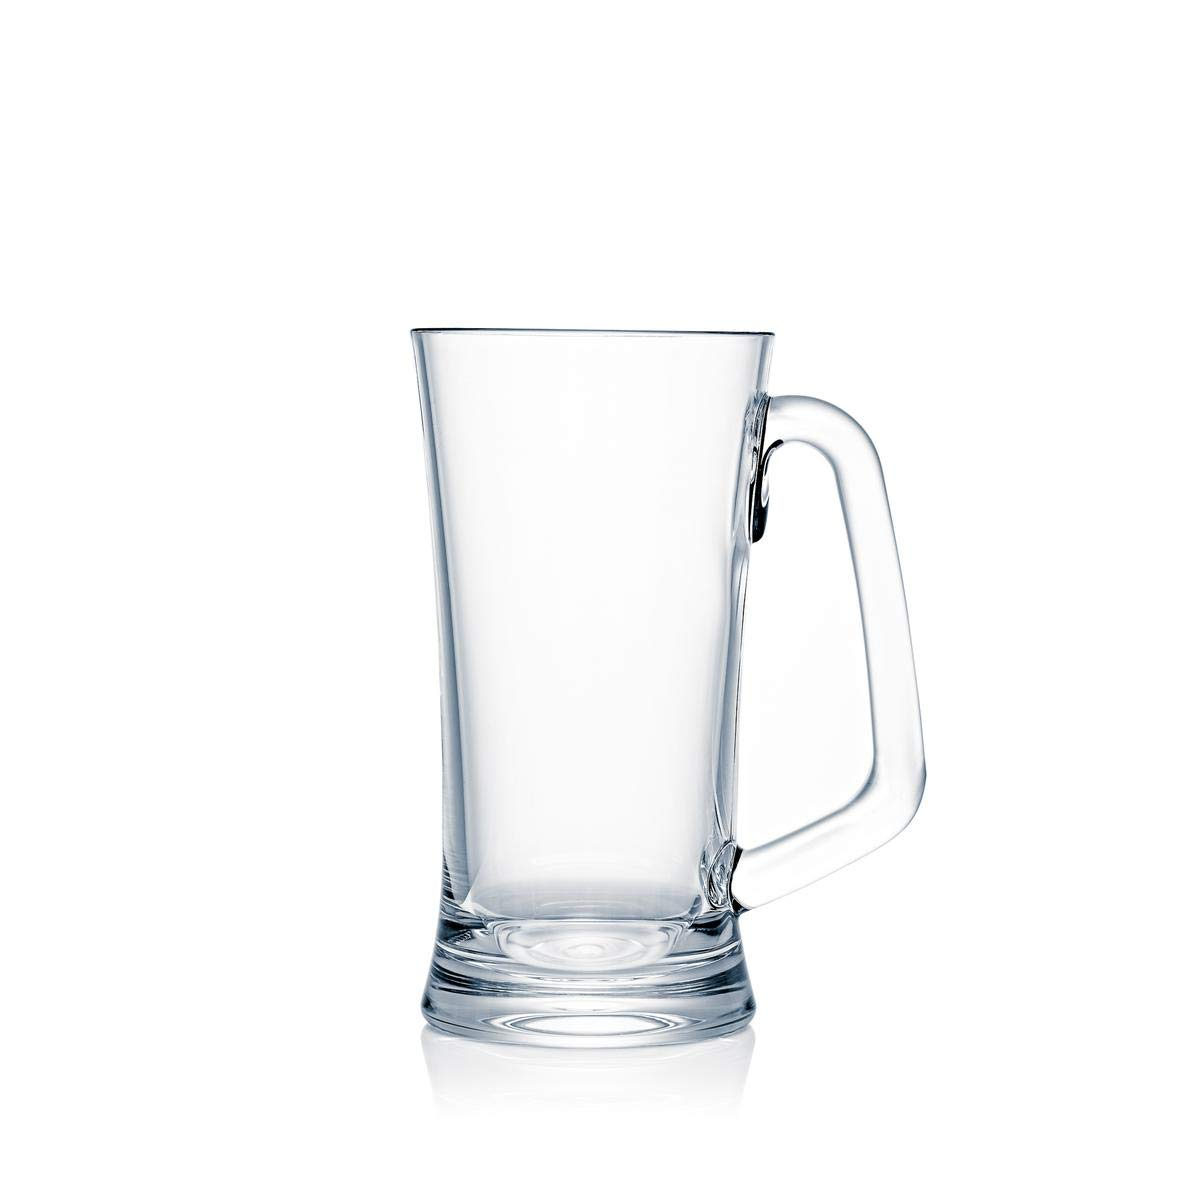 Strahl 40350 Design+Contemporary 17-oz Ranking Fashion TOP9 Beer of Set 4 Mug